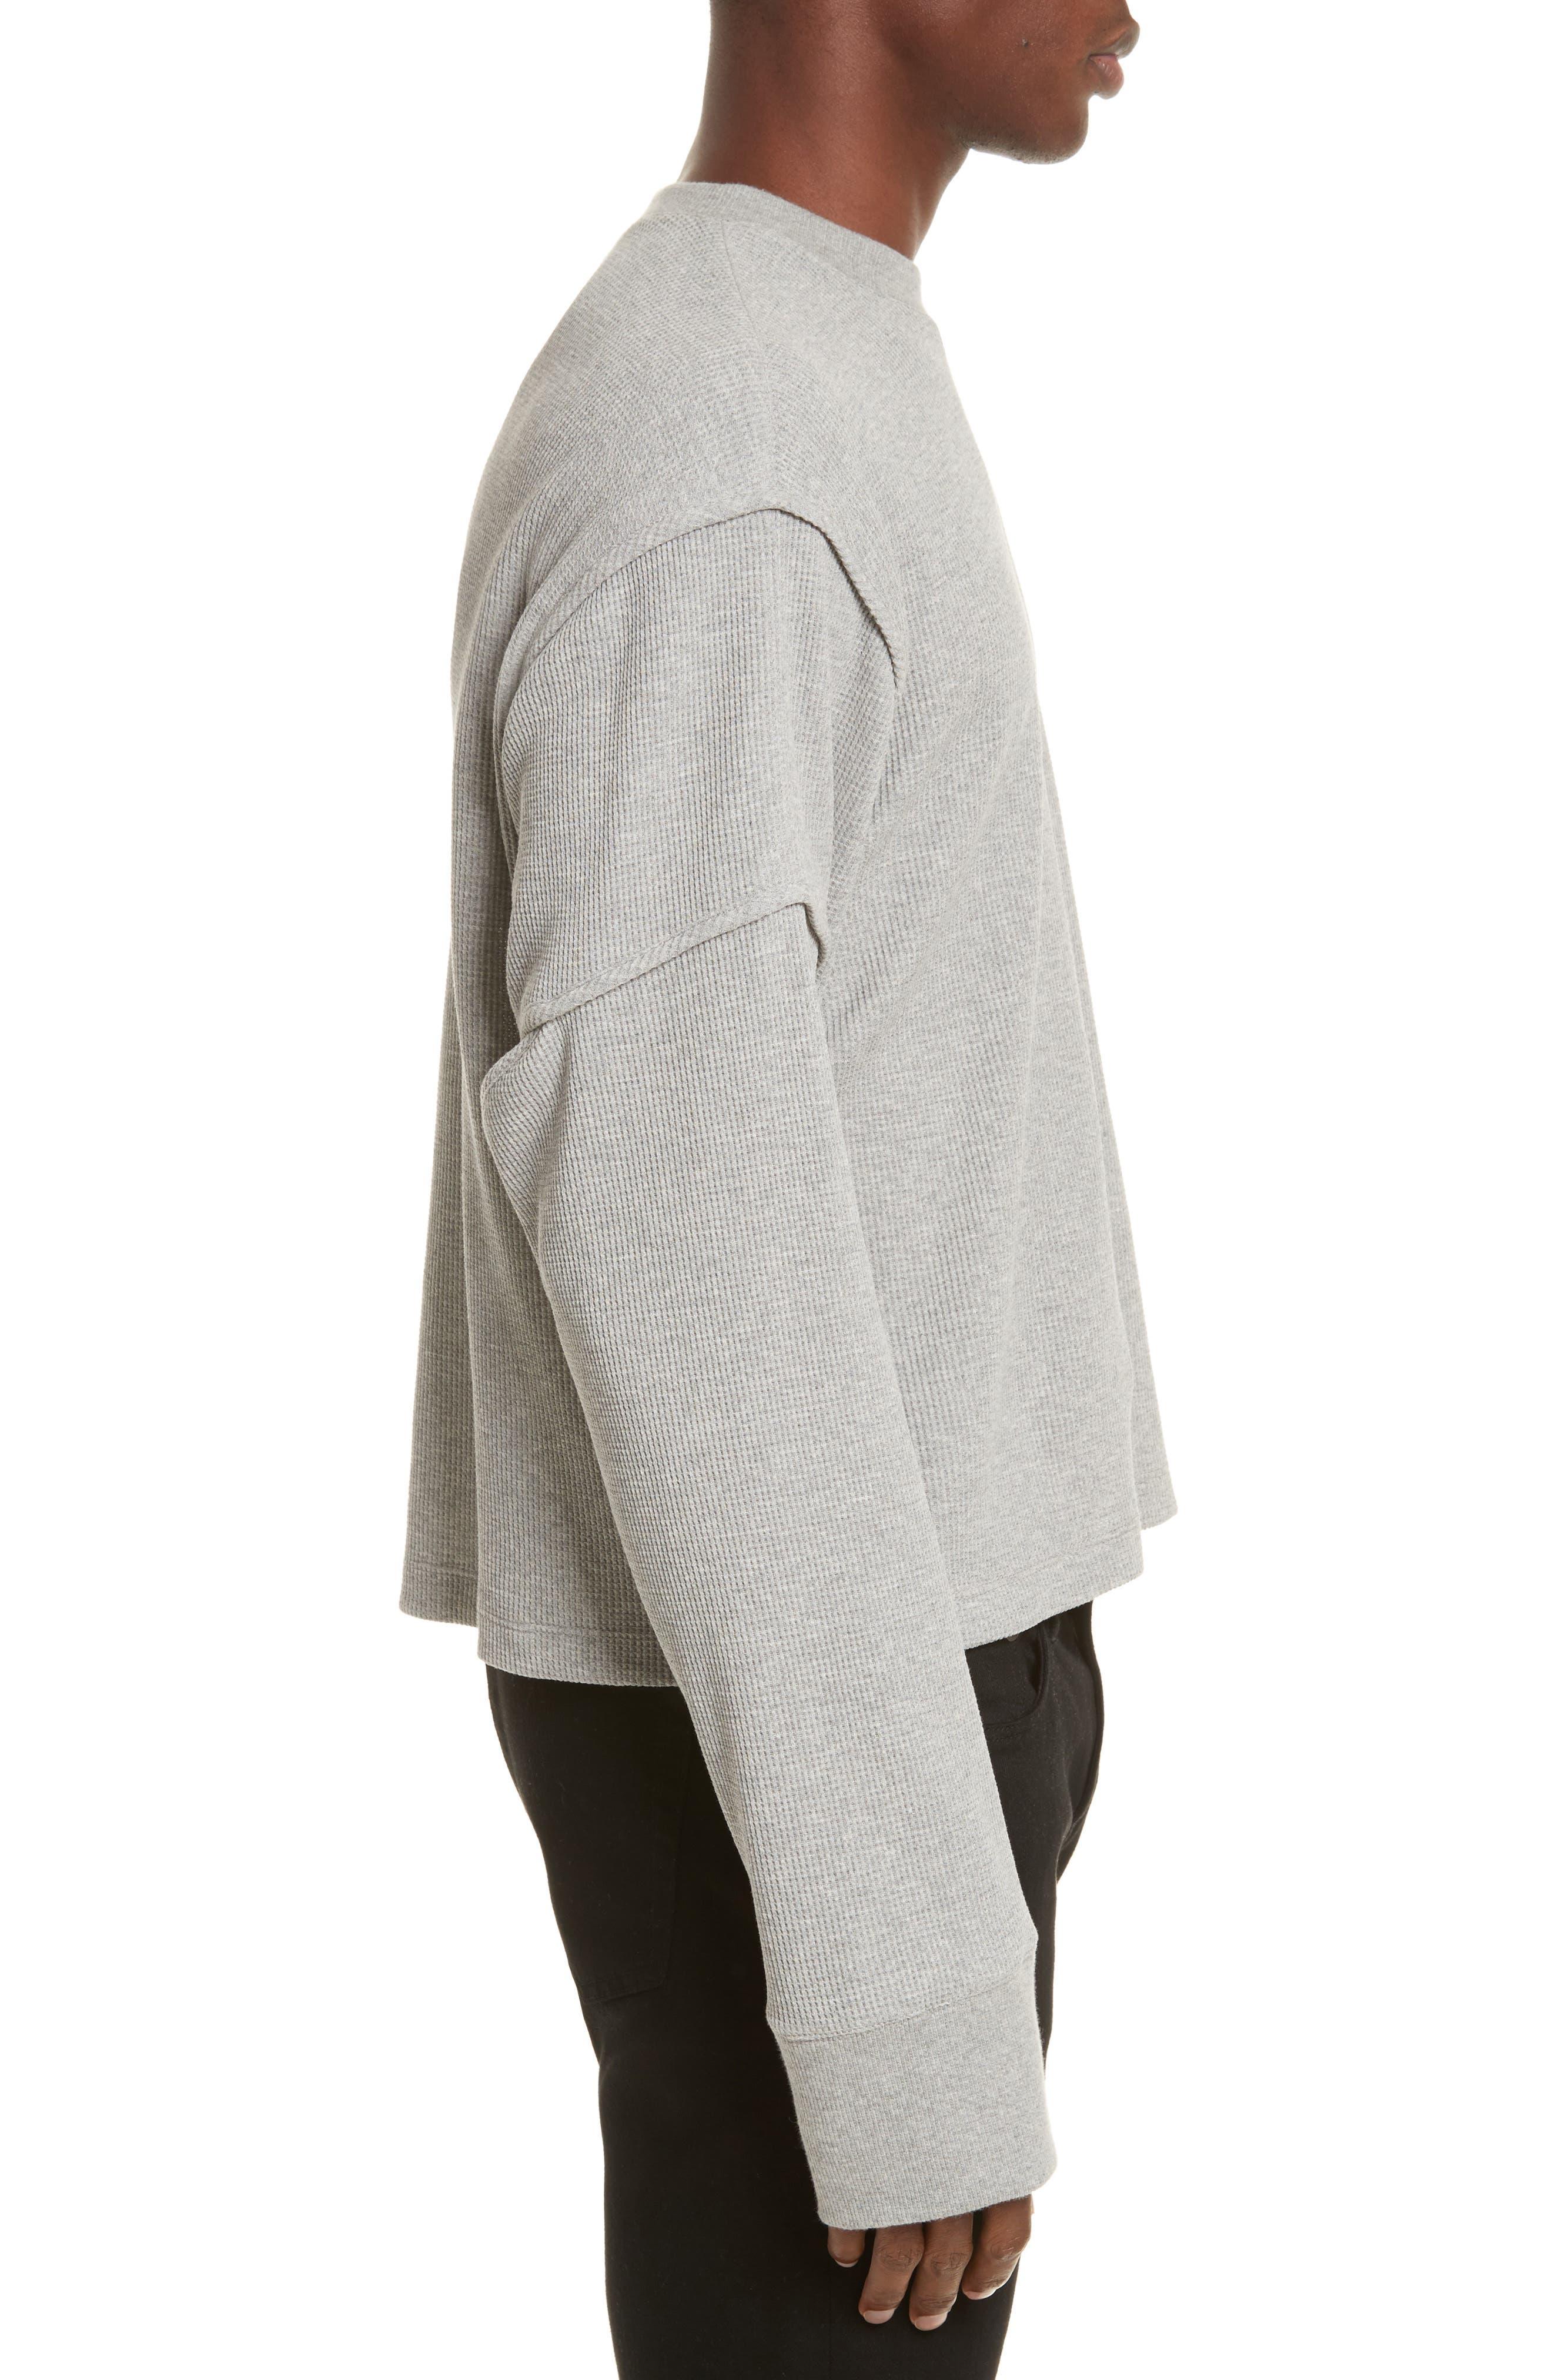 Military Panel Sleeve Thermal Shirt,                             Alternate thumbnail 3, color,                             029